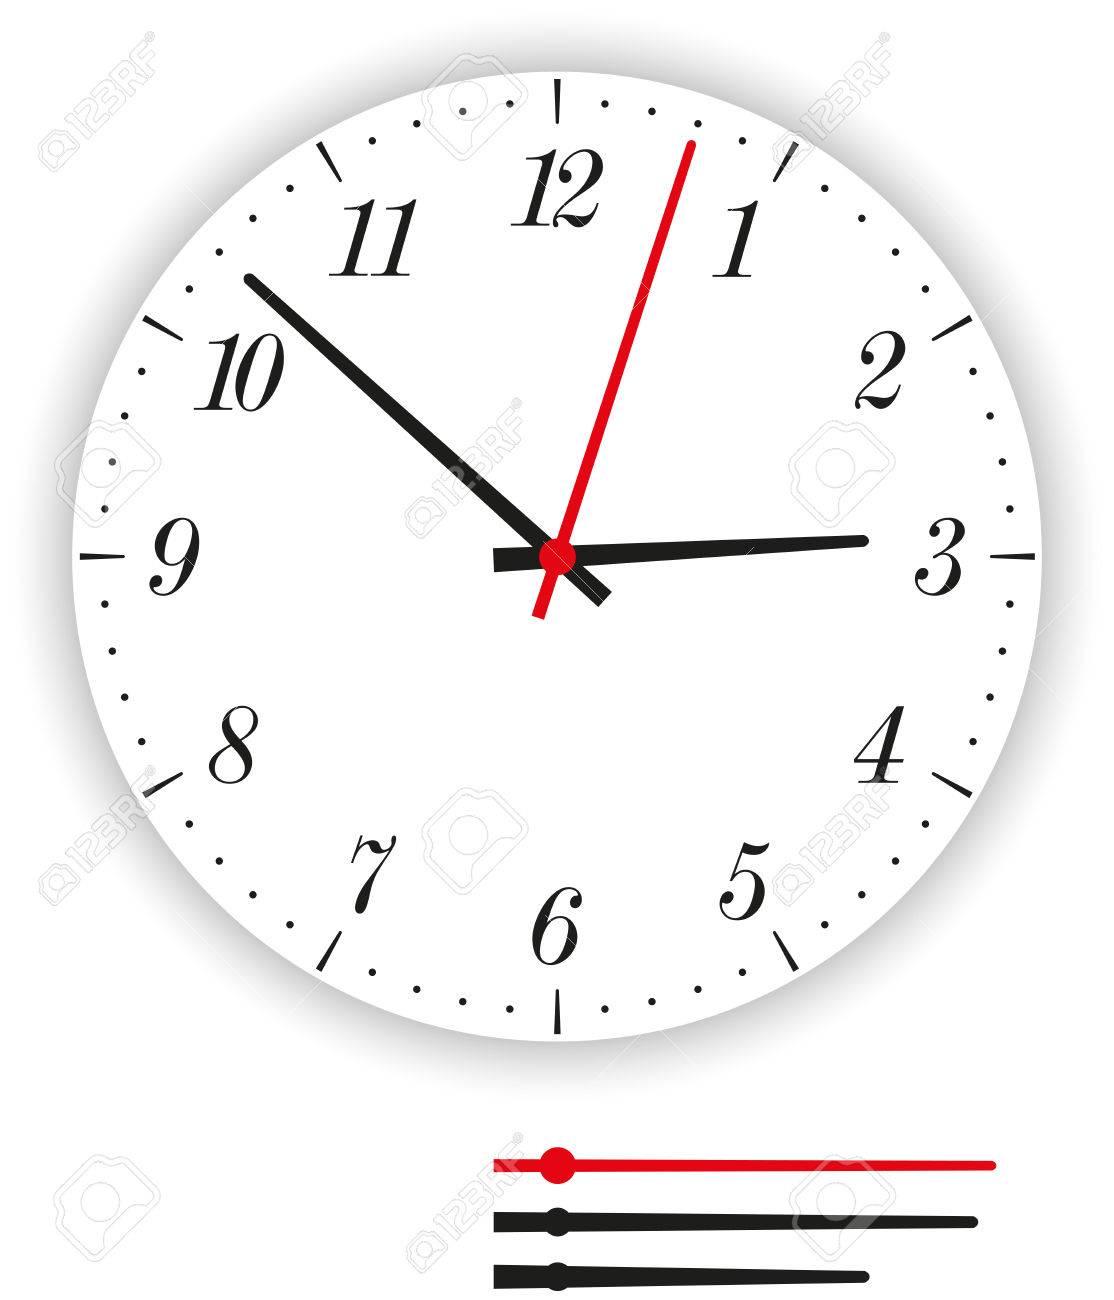 Fullsize Of Cool Clock Faces